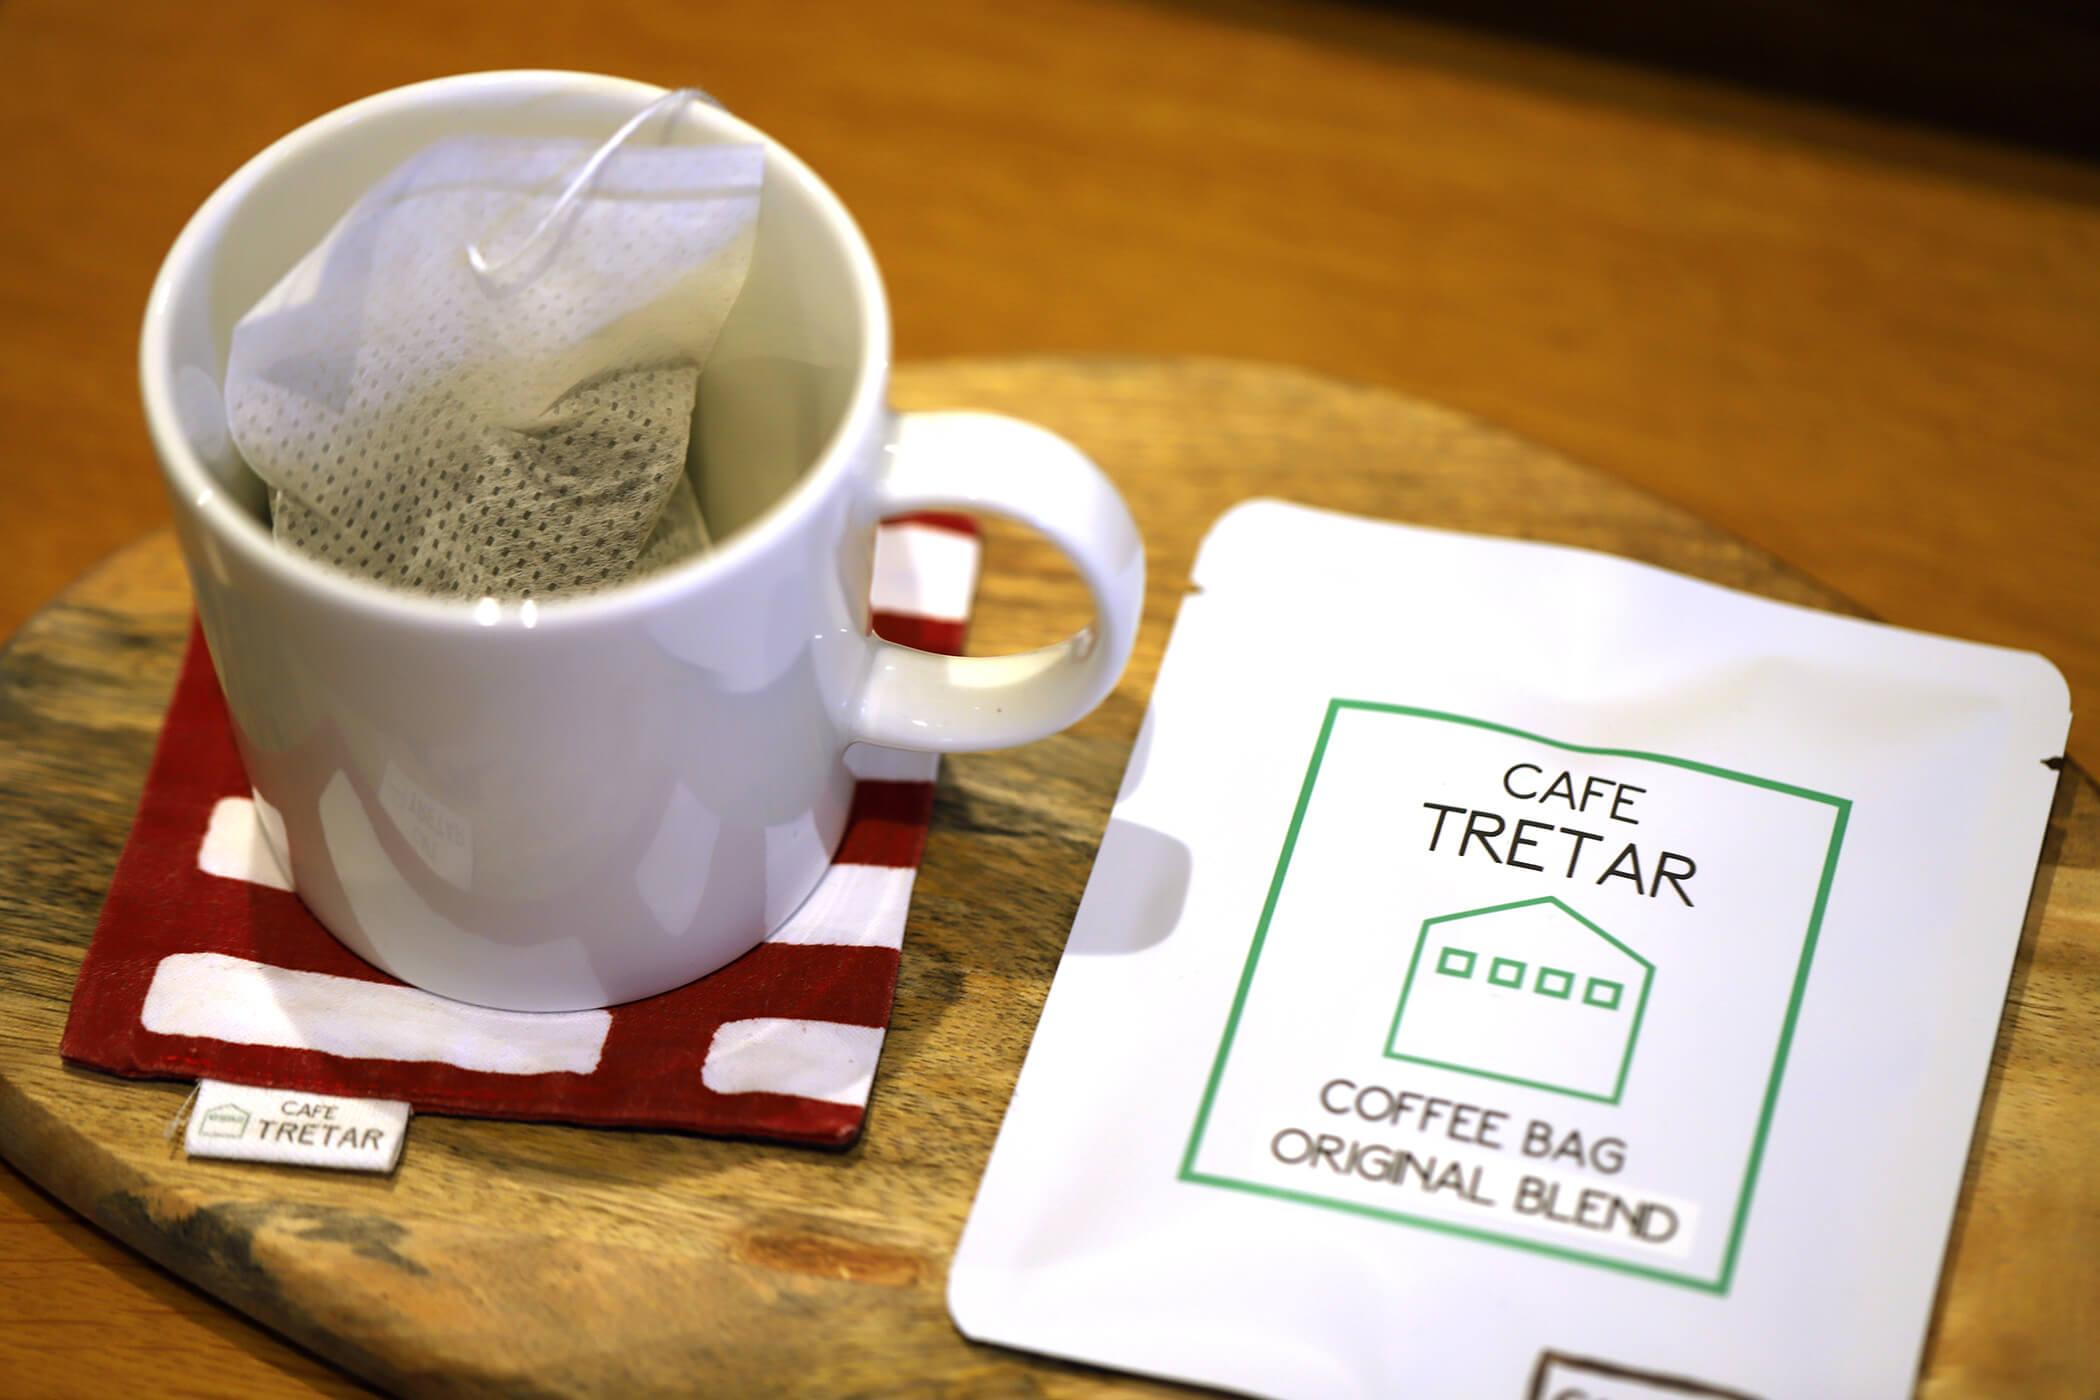 CAFE TRETAR 写真15